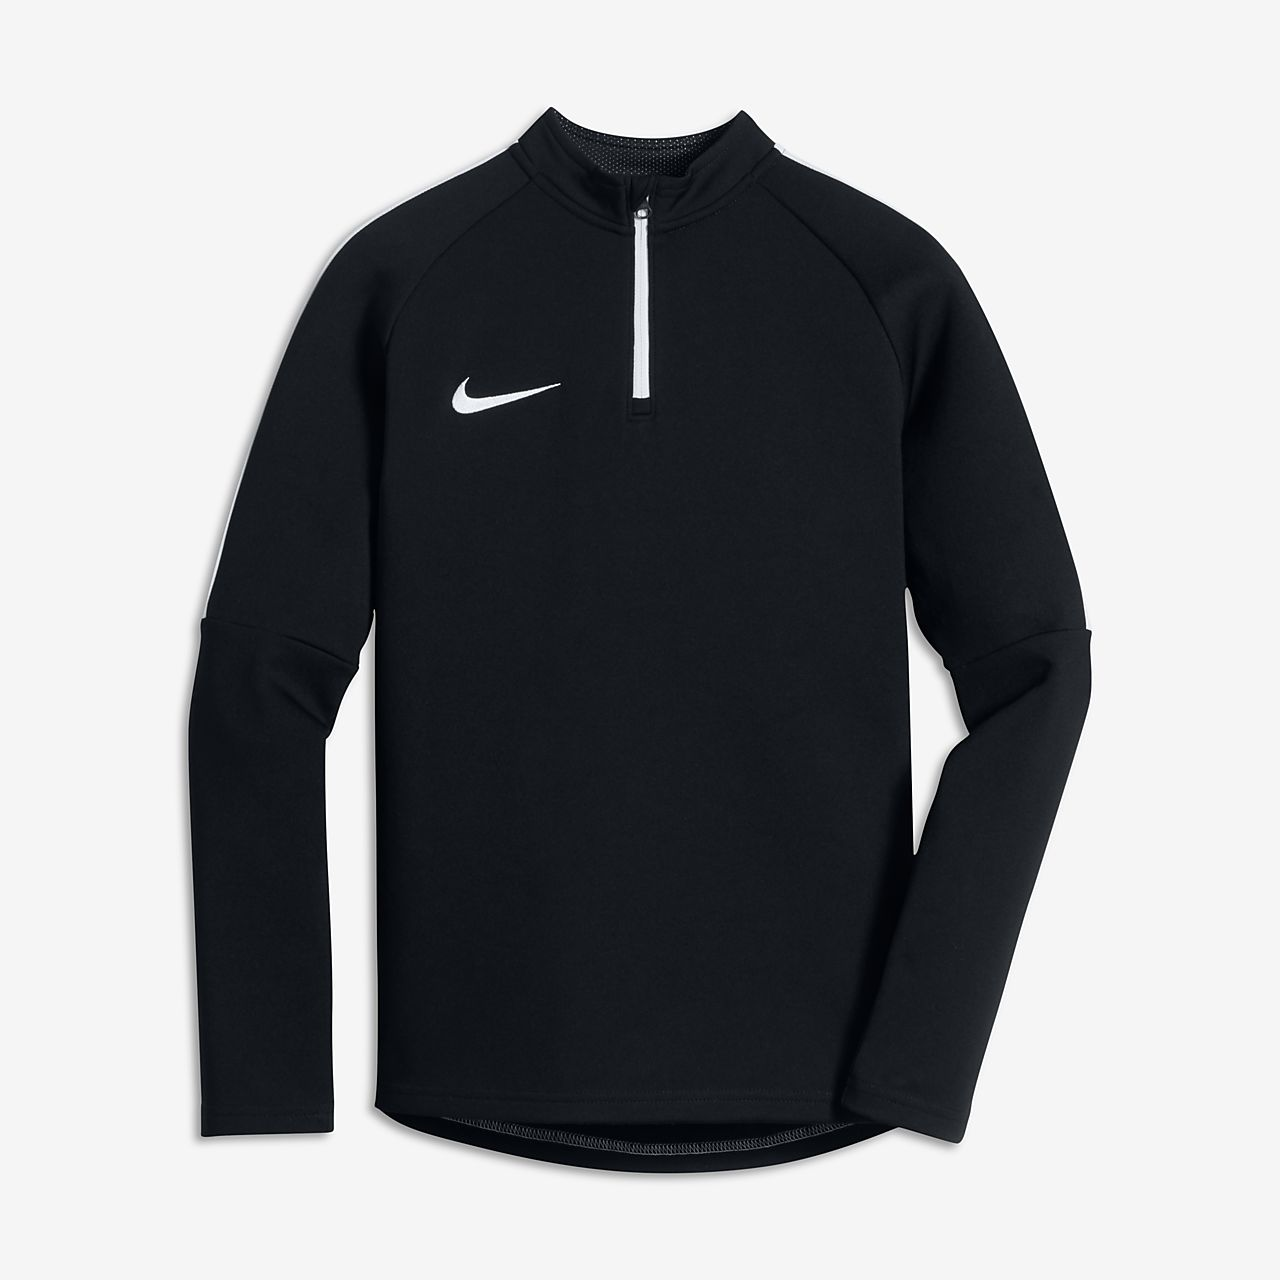 Nike Dry Big Kids' Soccer Drill Tops Black/White